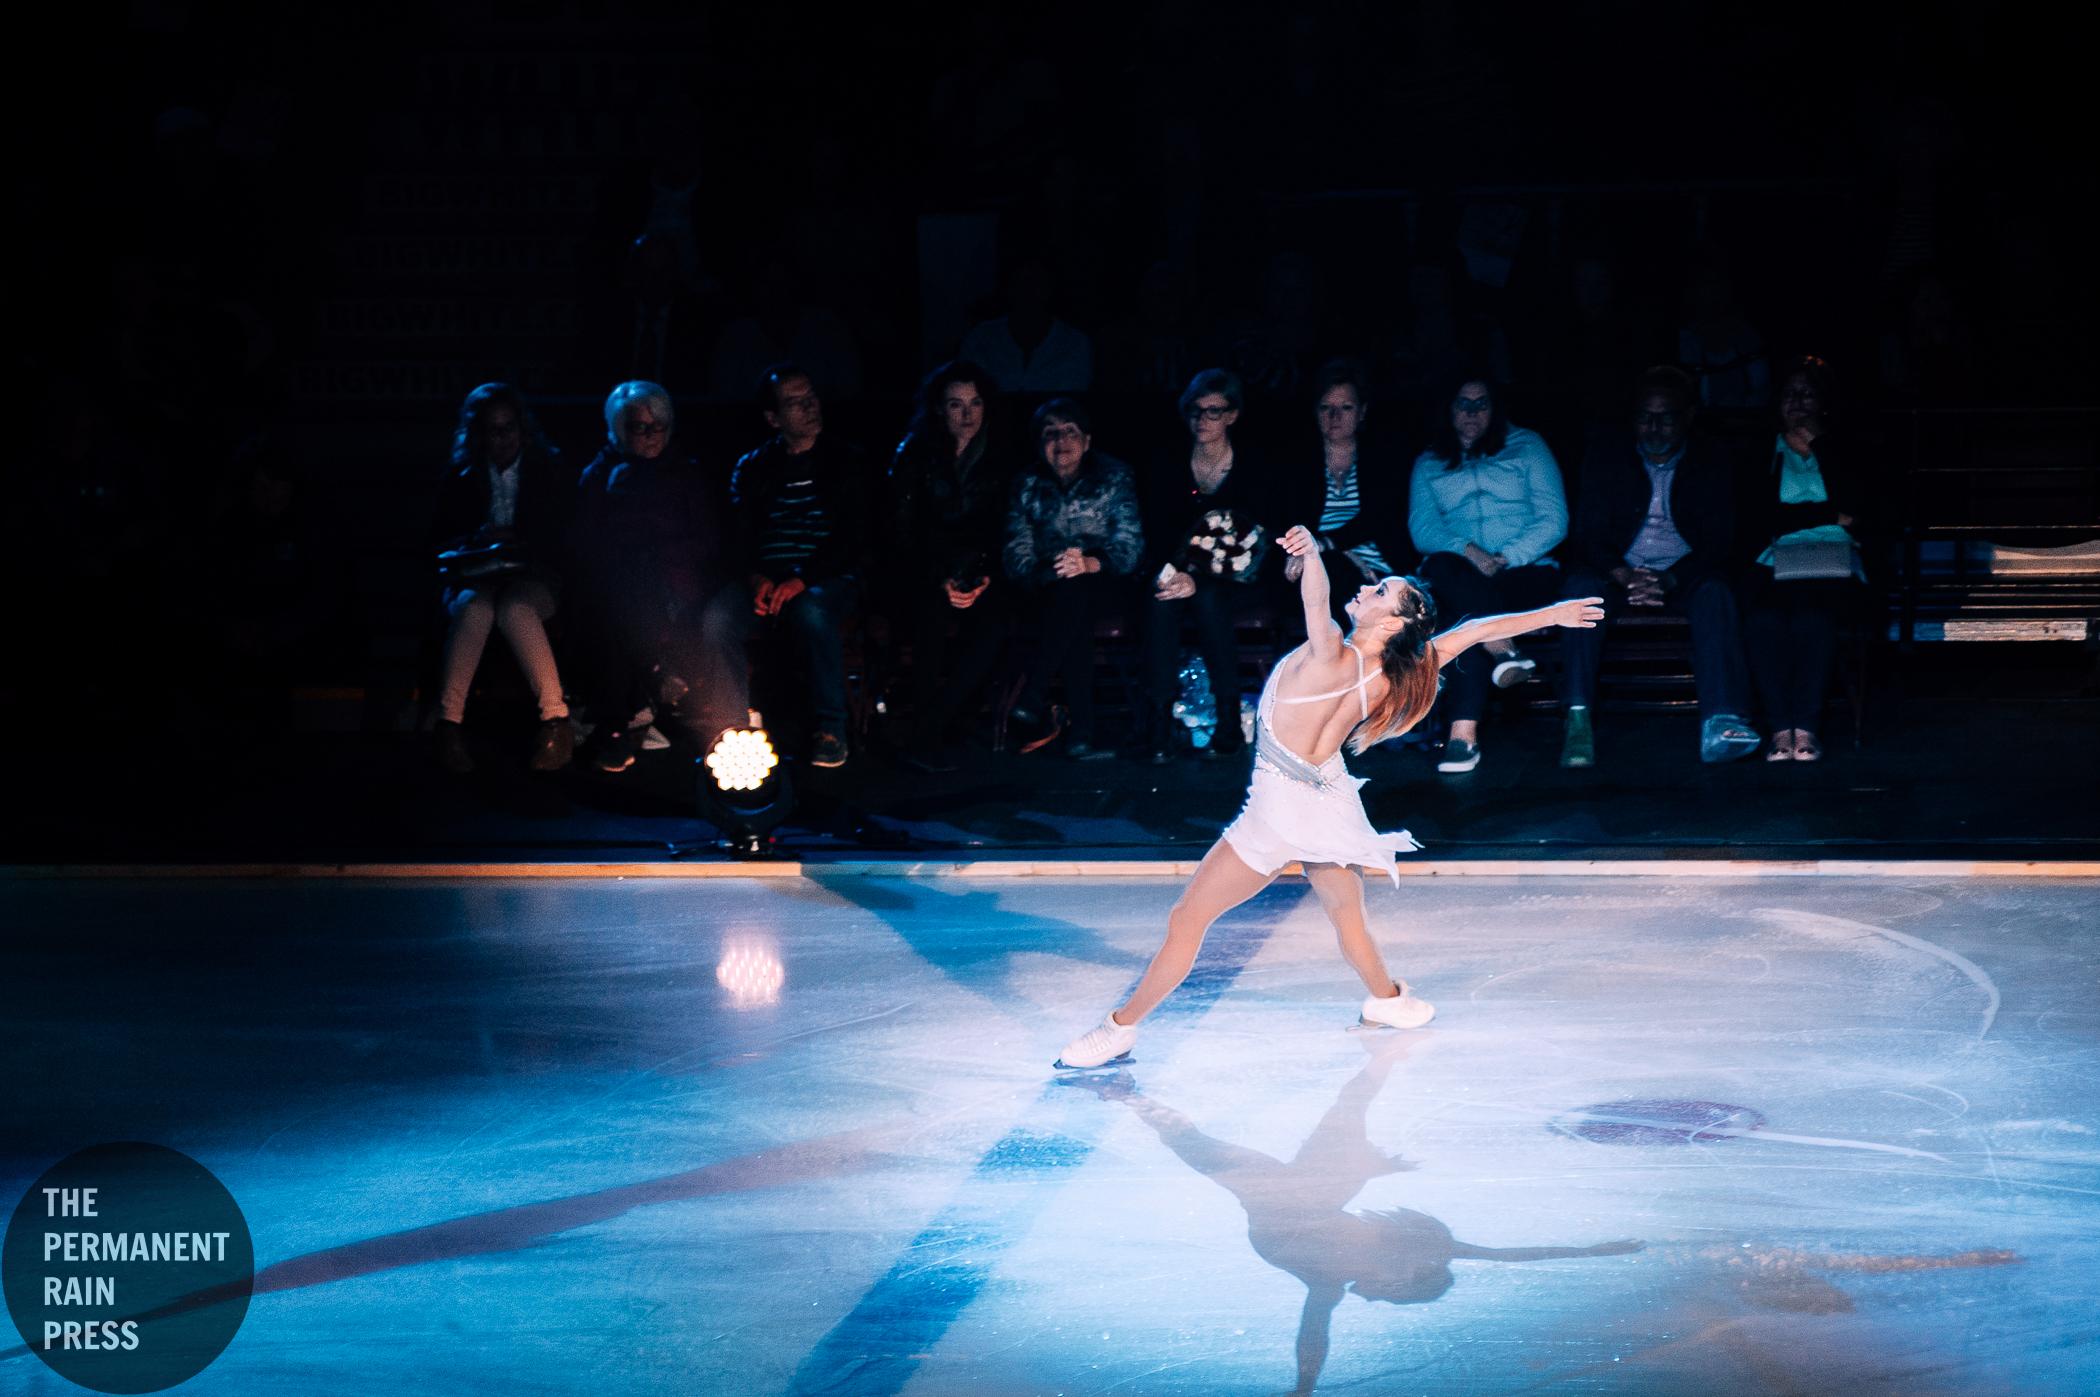 Stars_On_Ice-Rogers-Arena_Timothy_Nguyen-34.jpg